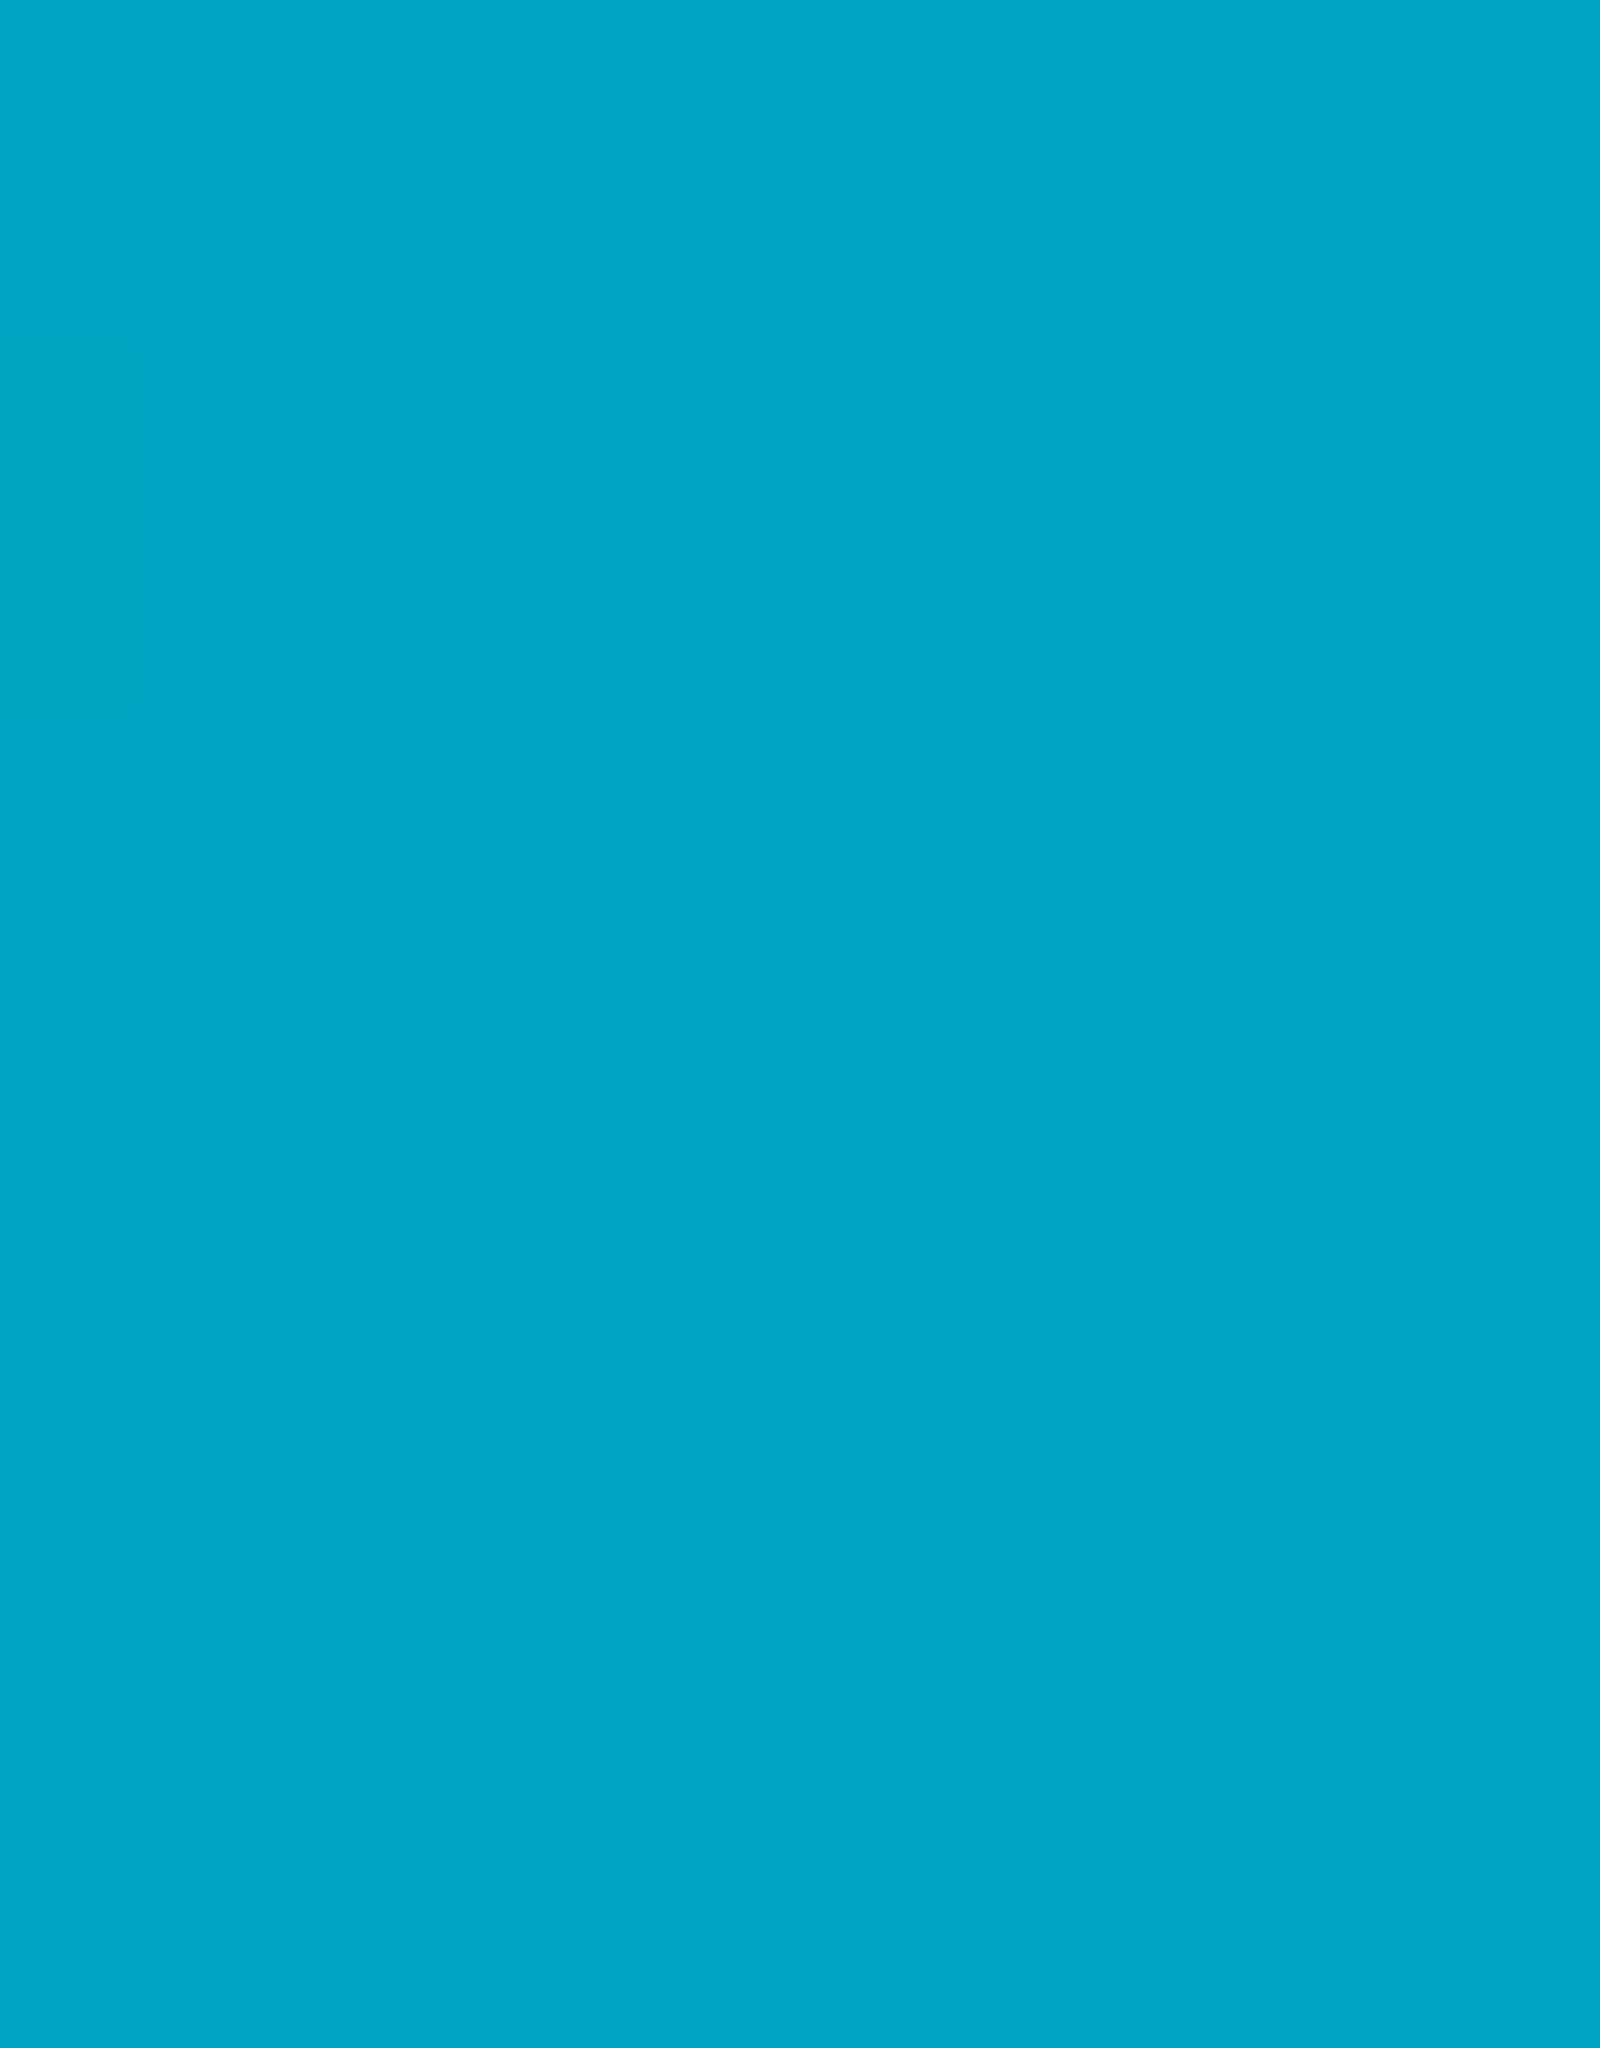 Jacquard Dye-na-Flow Turquoise